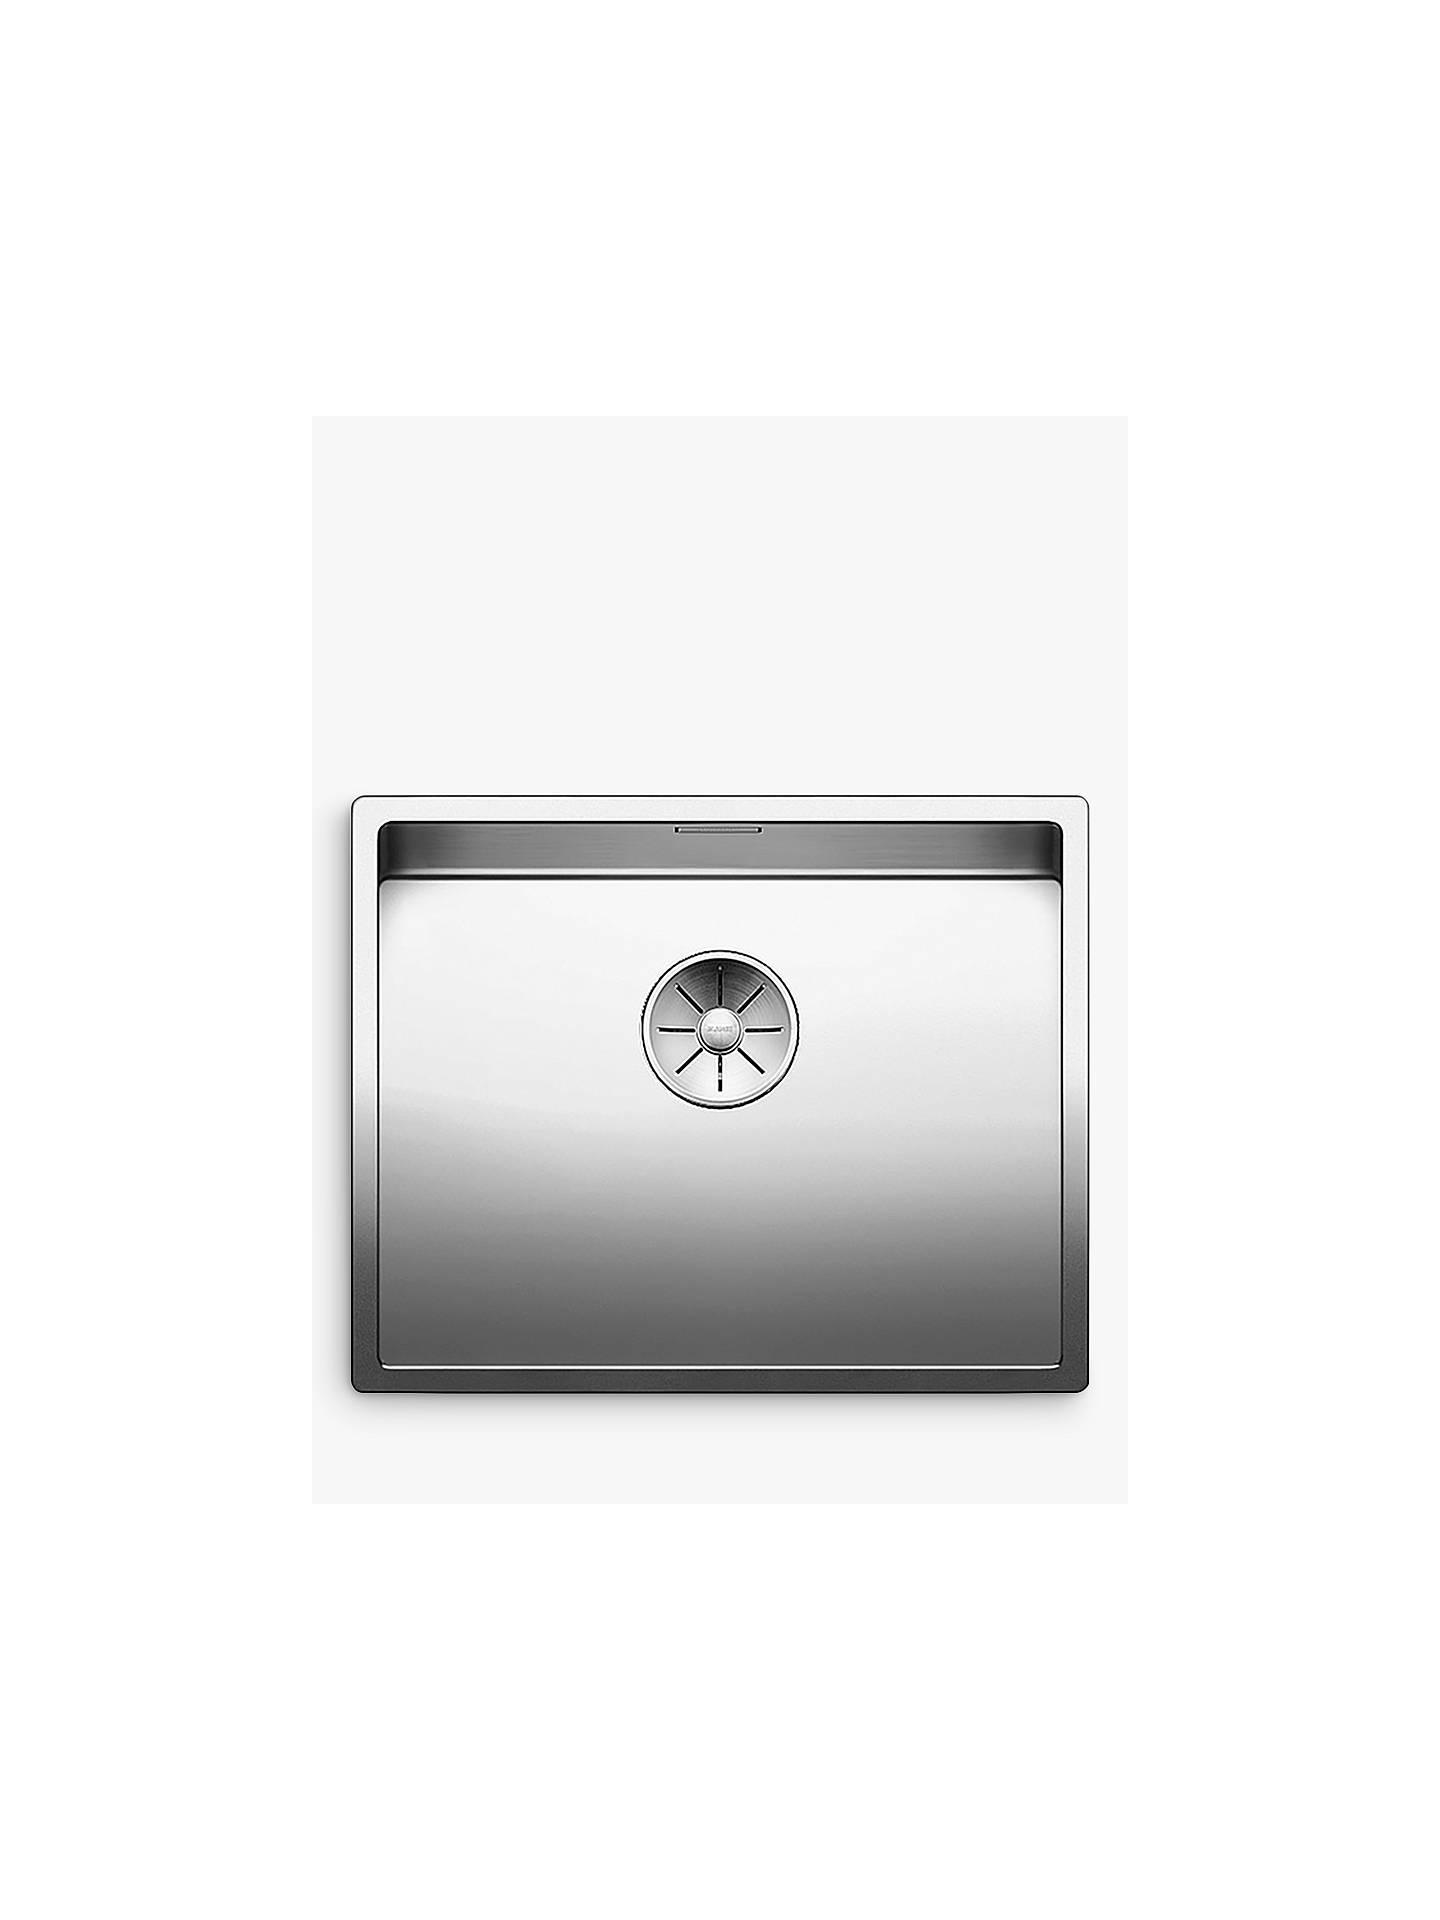 Blanco Claron 500-U Single Bowl Undermounted Kitchen Sink